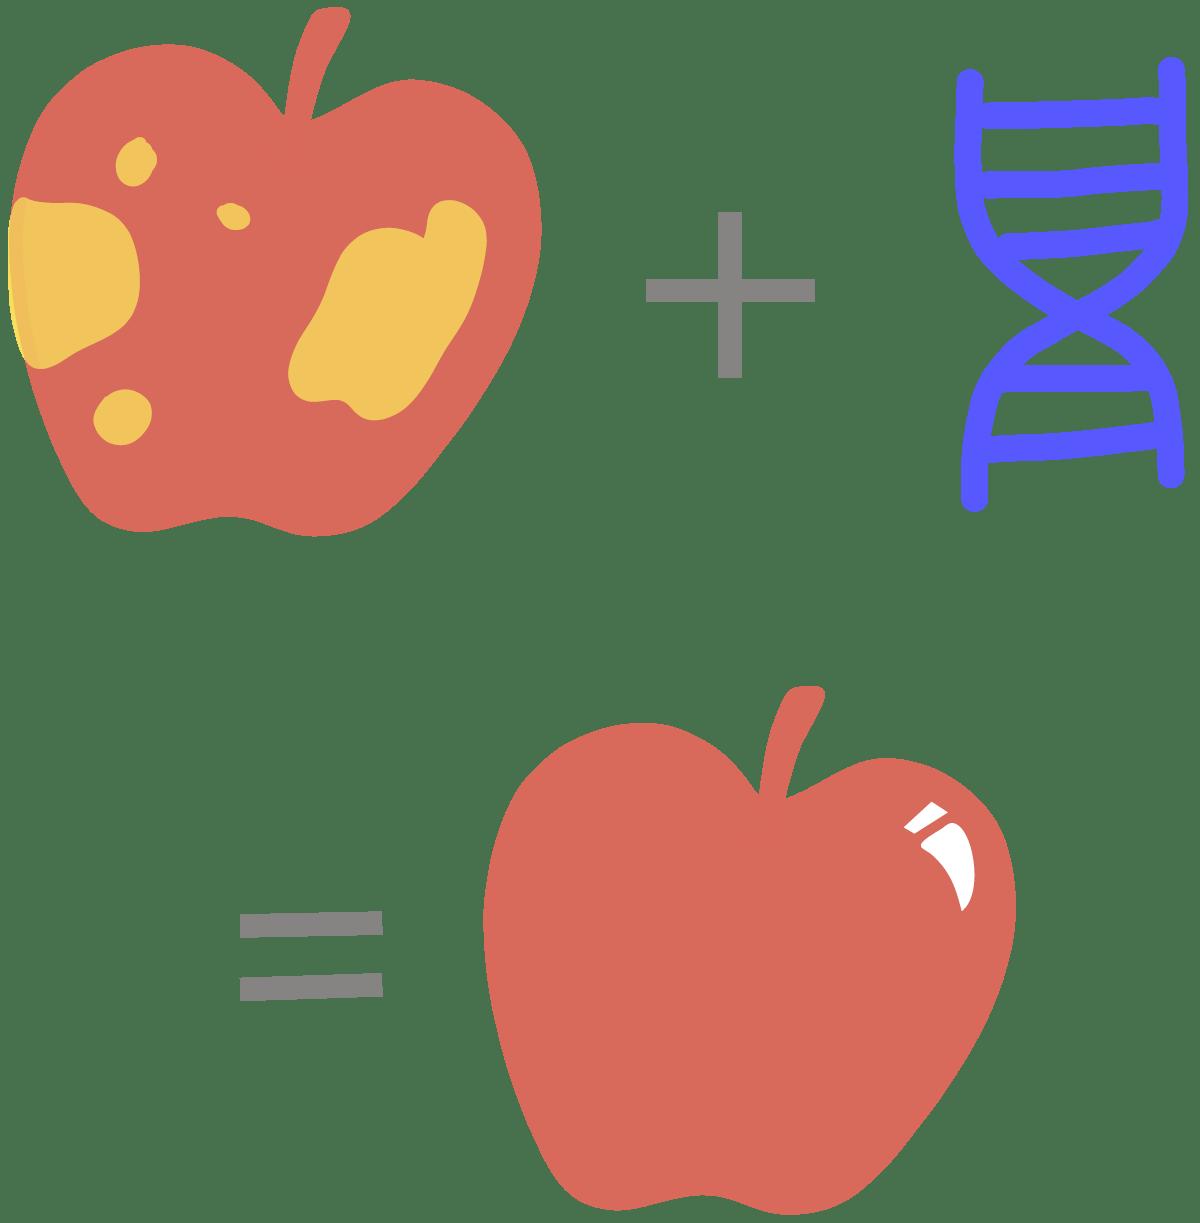 Split apple clipart picture Glossary - Innovative Genomics Institute (IGI) picture